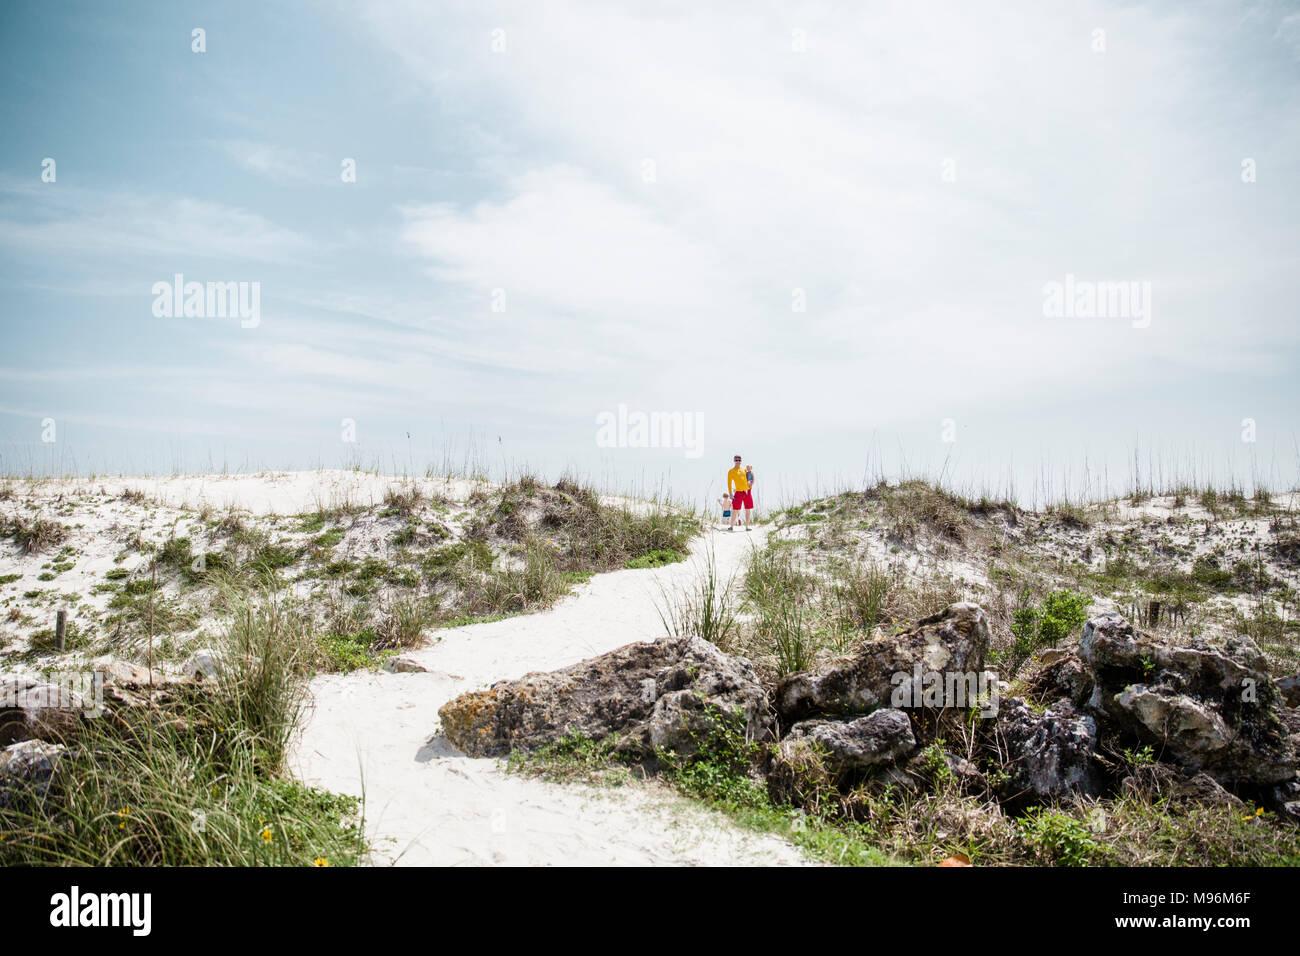 Family walking around the beach - Stock Image